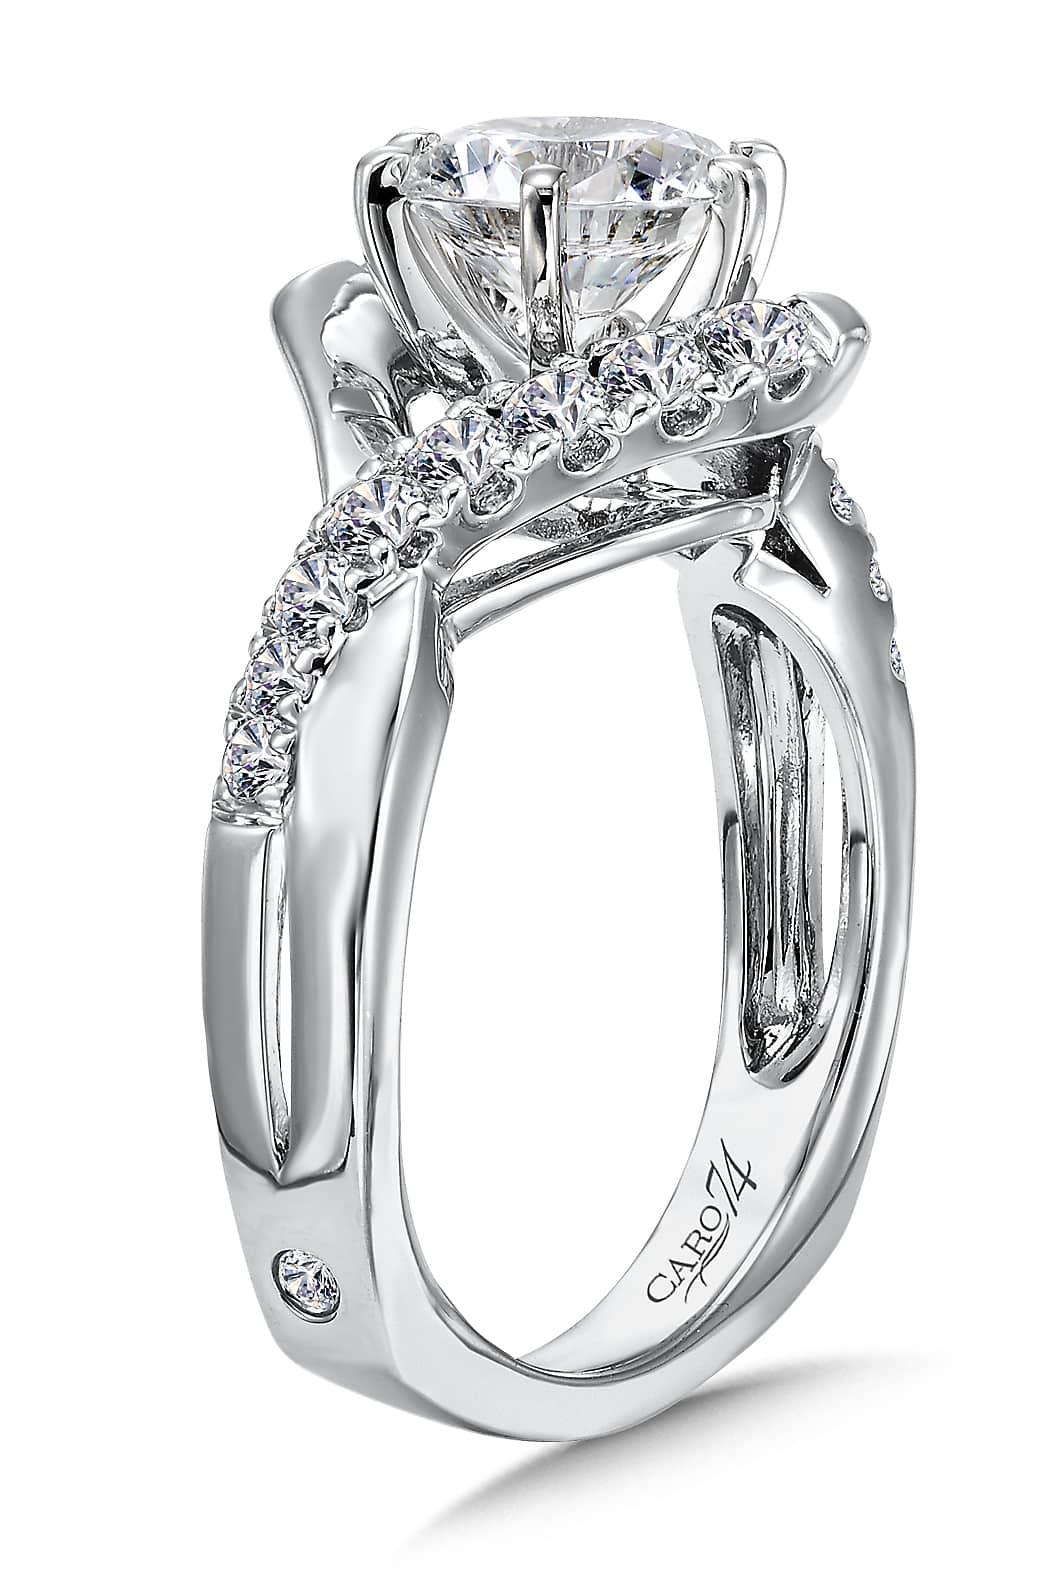 Wholesale Custom Engagement Rings Dallas 1, Shira Diamonds